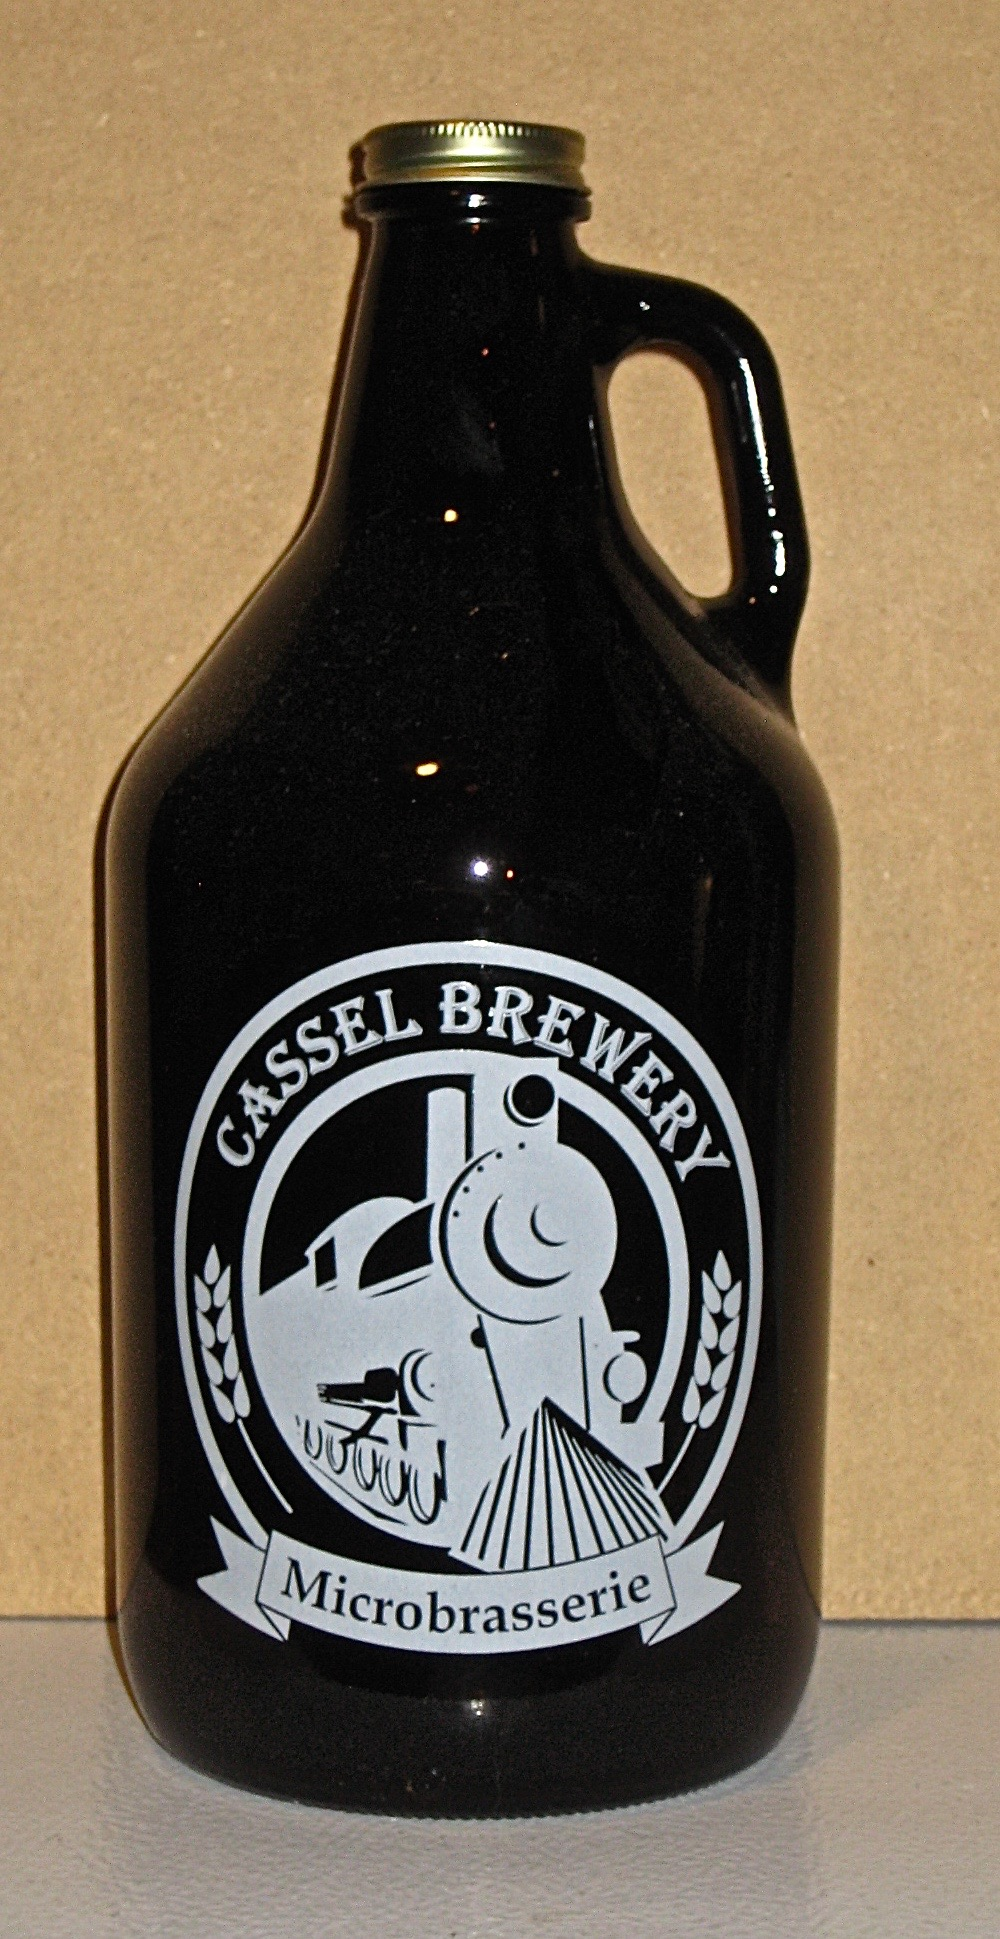 GR - Cassel Brewing (ON).jpg